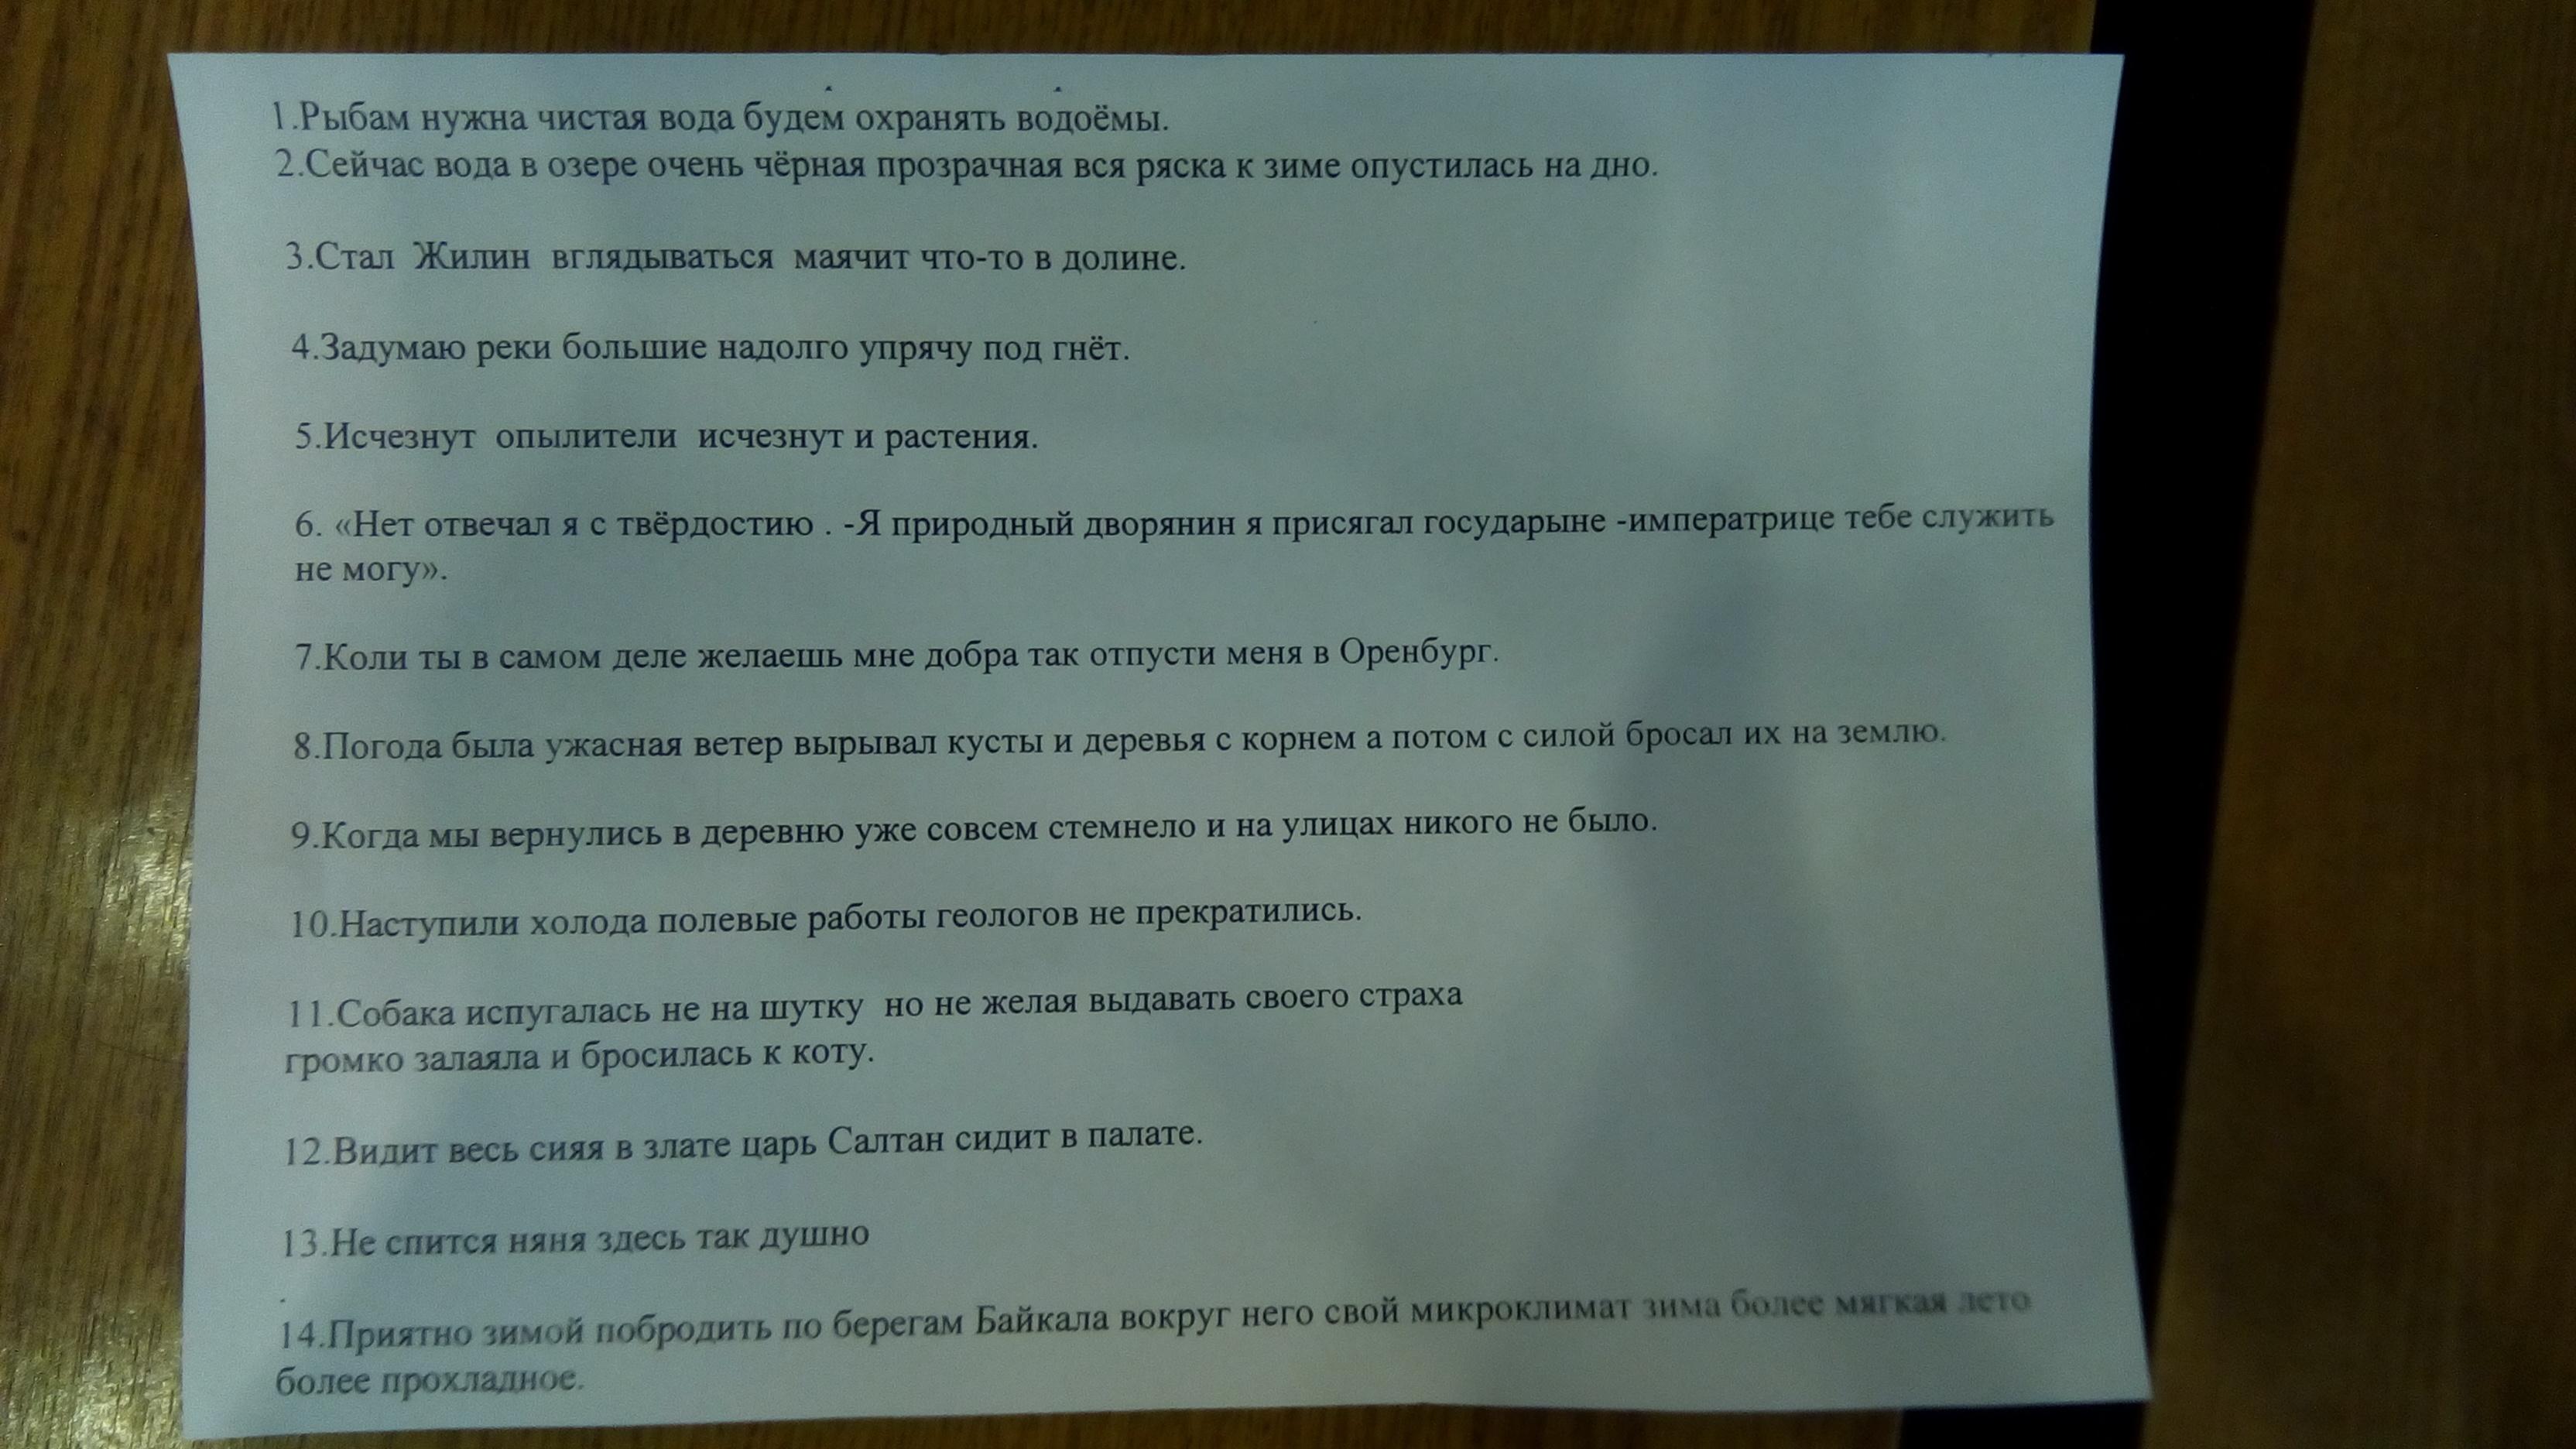 пояснение в схеме предложения